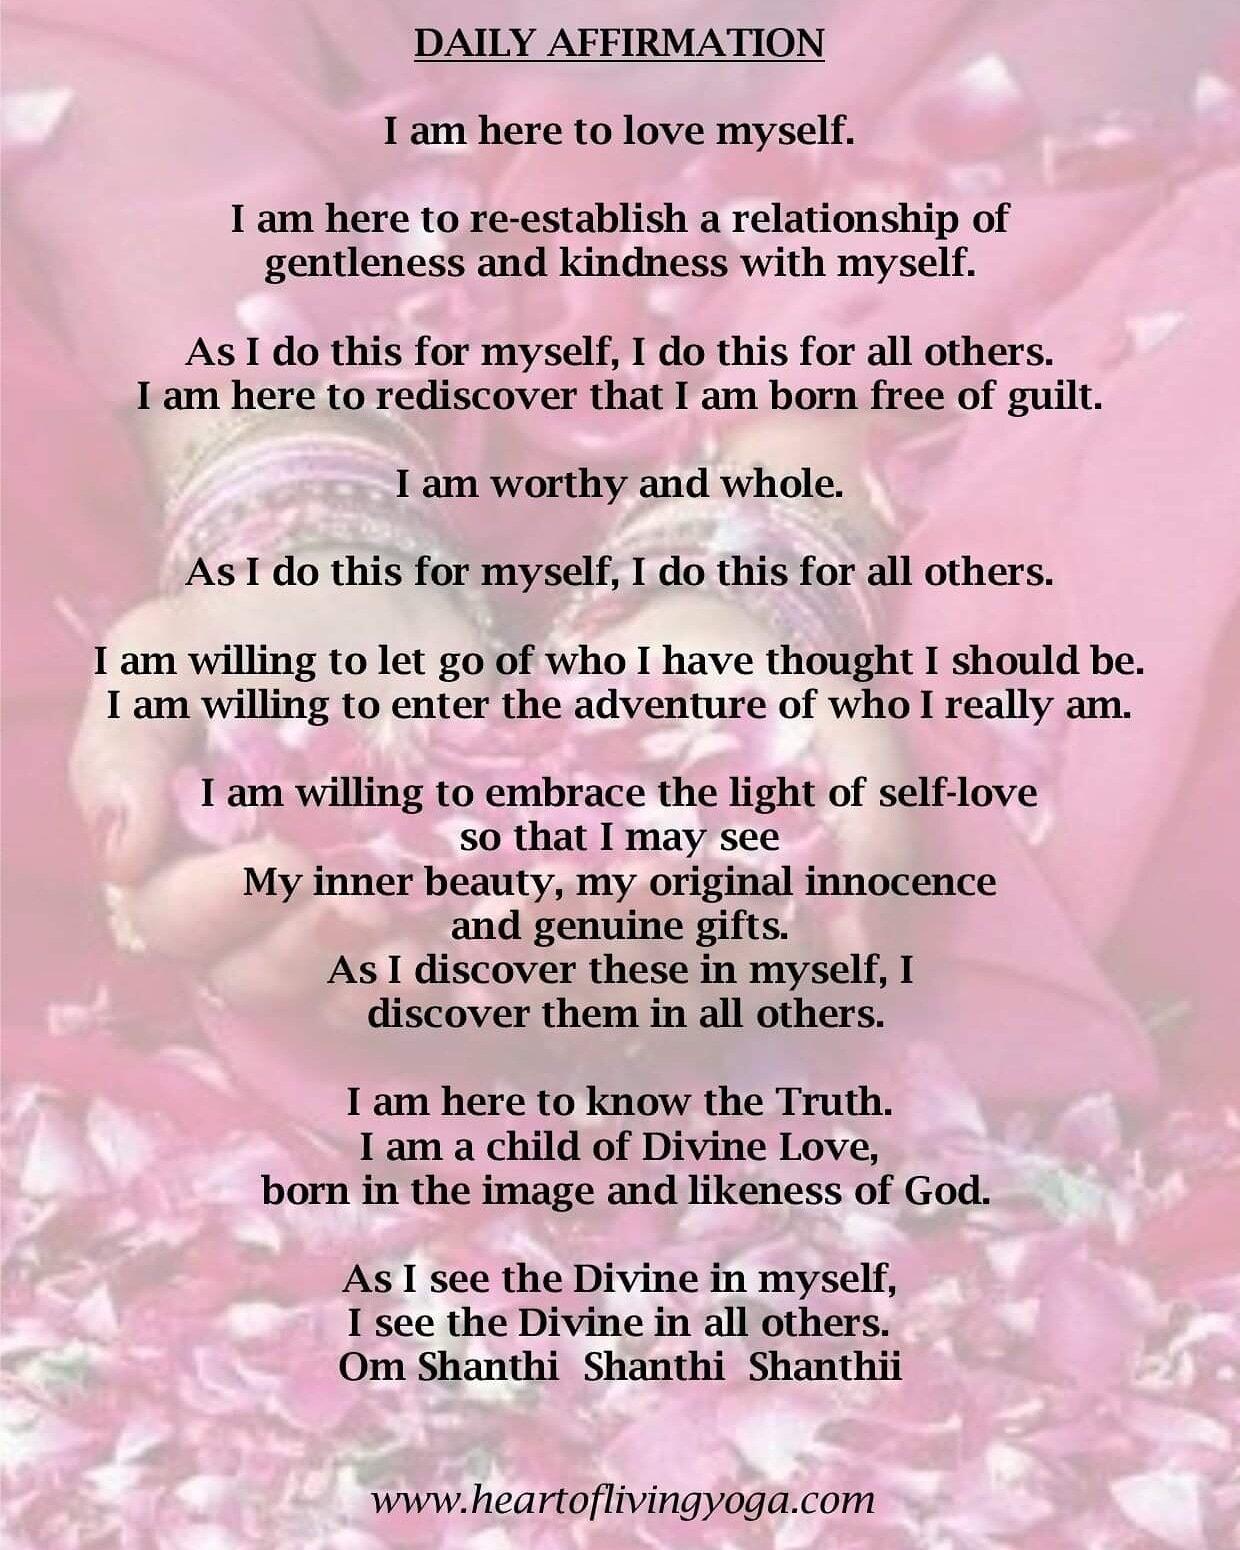 heart  of living yoga daily affirmation.jpg